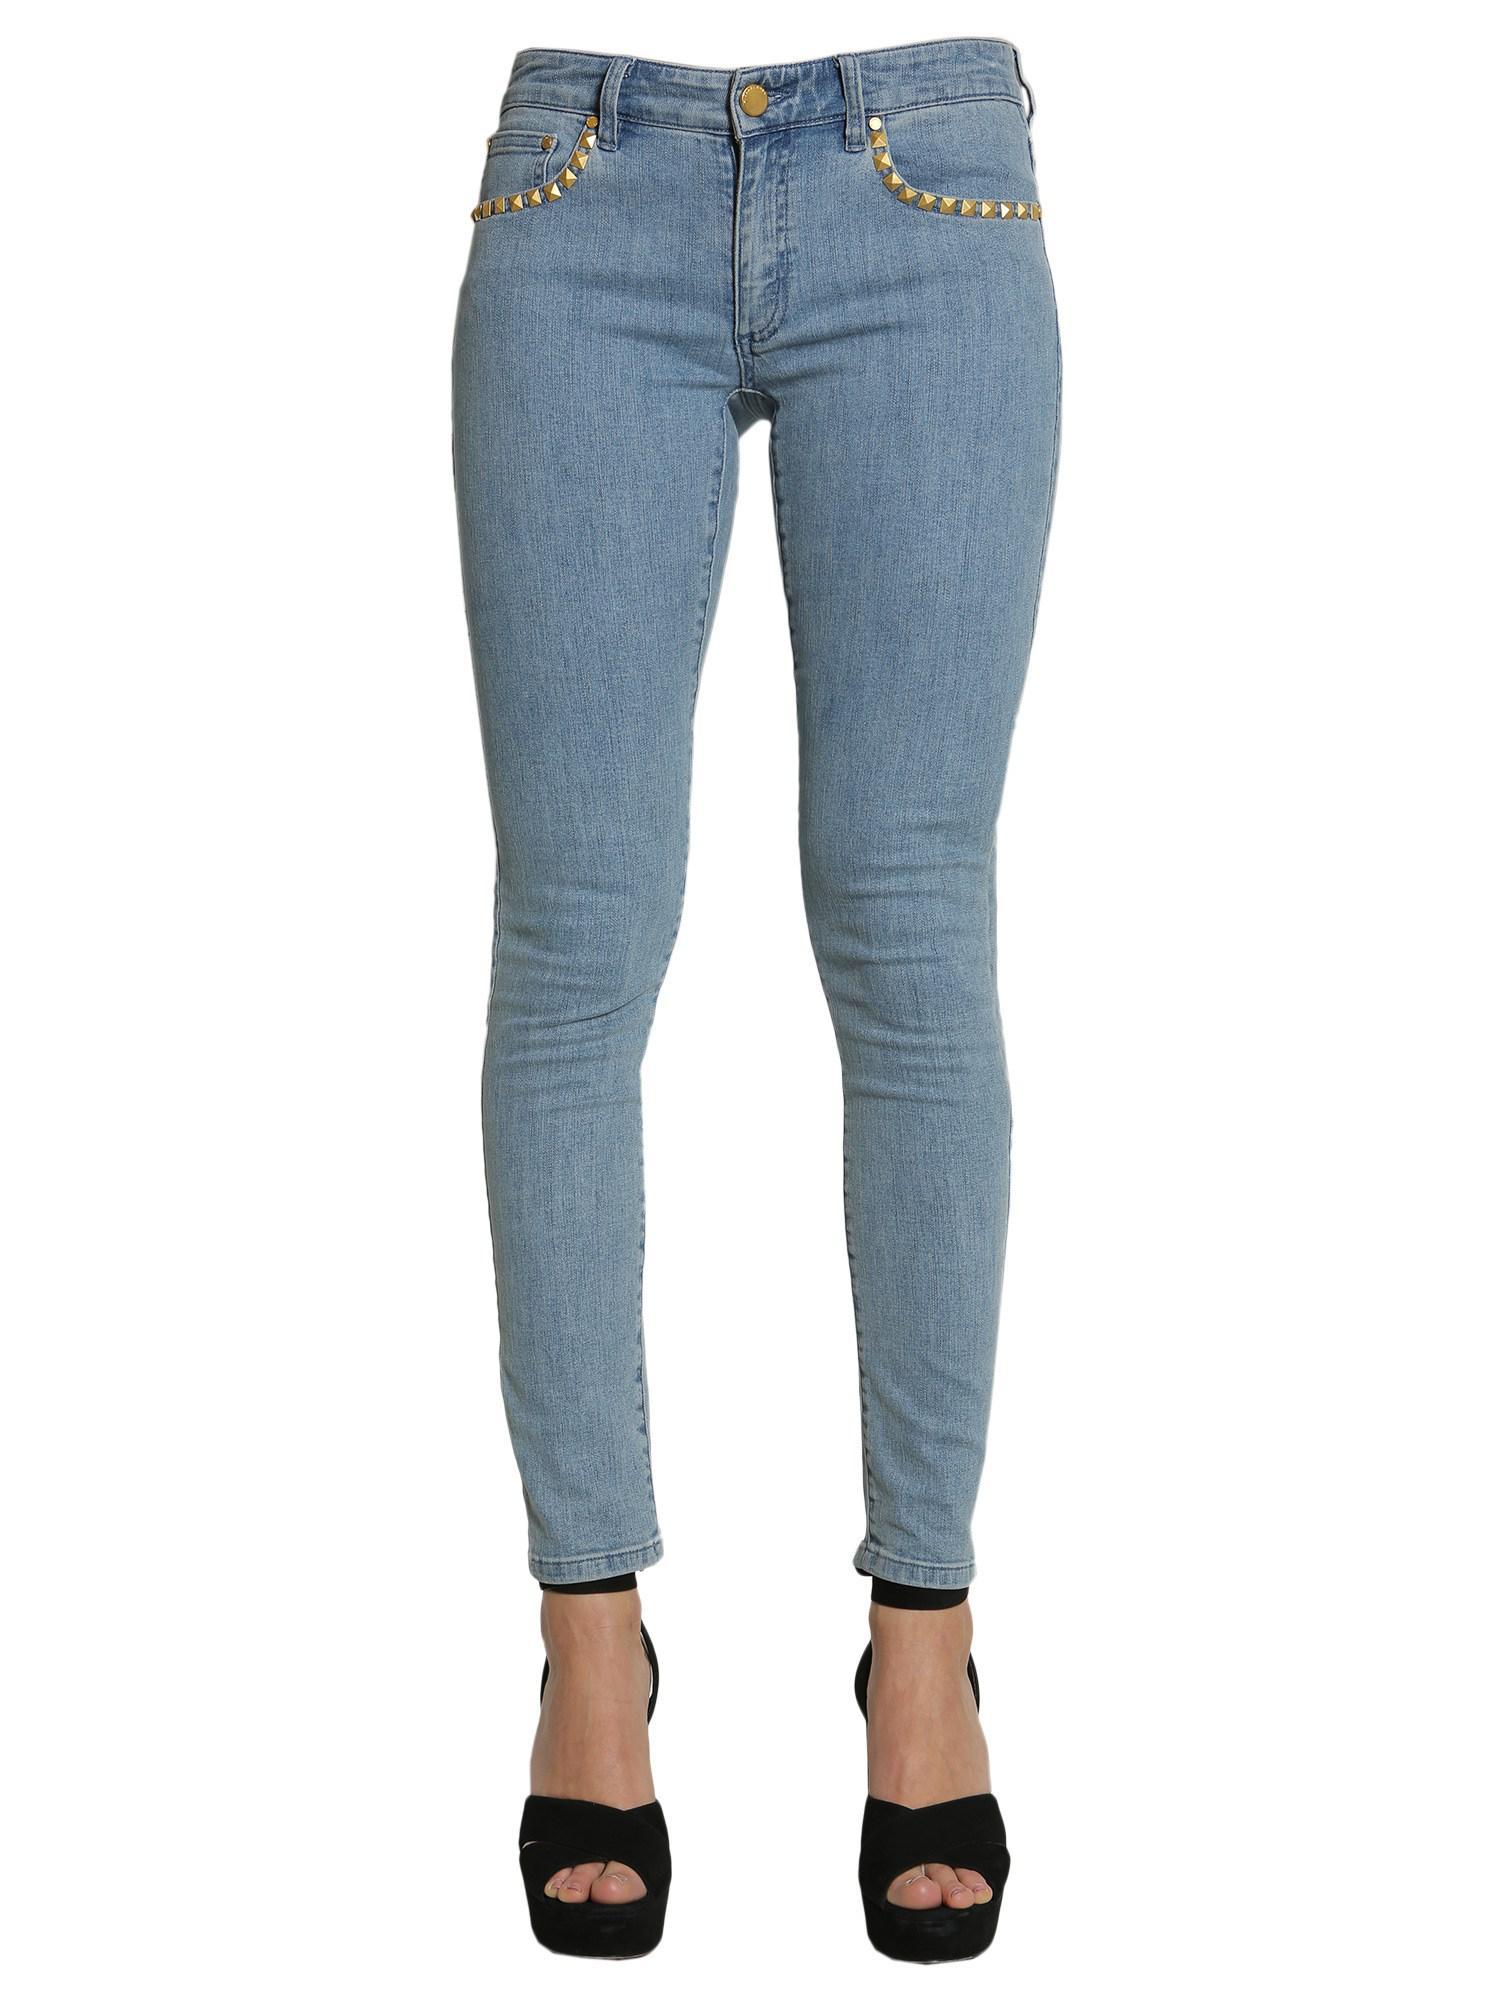 6dc8012faf7 Lyst - MICHAEL Michael Kors Jeans